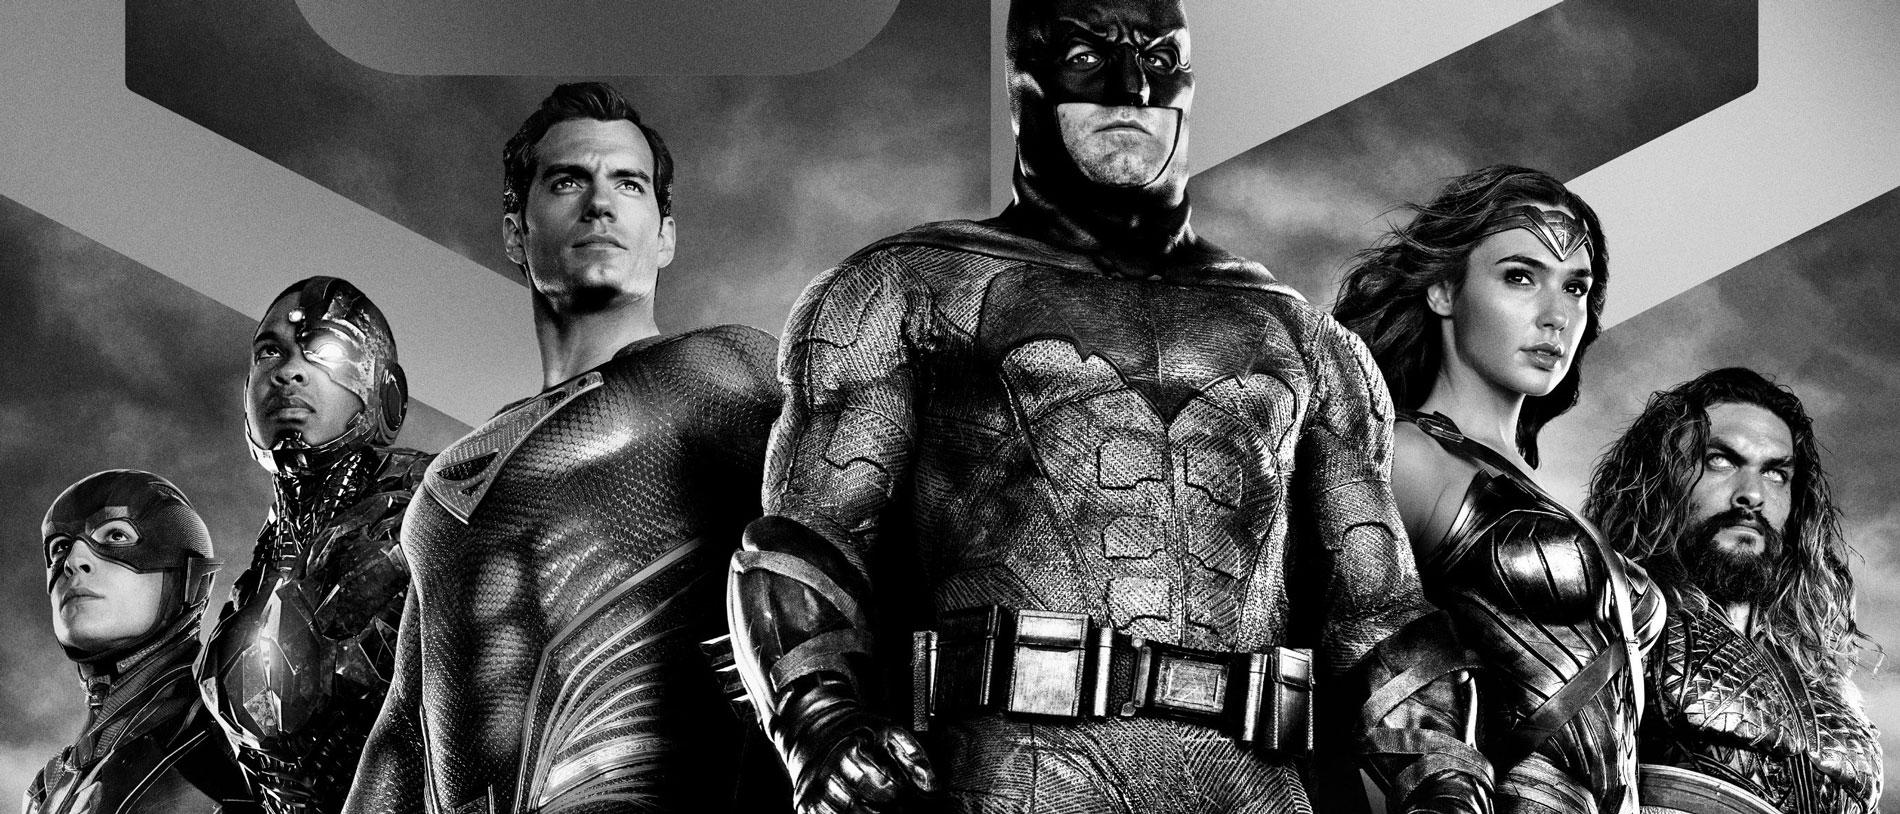 Zack-Snyders-Justice-League-SnyderVerse-History